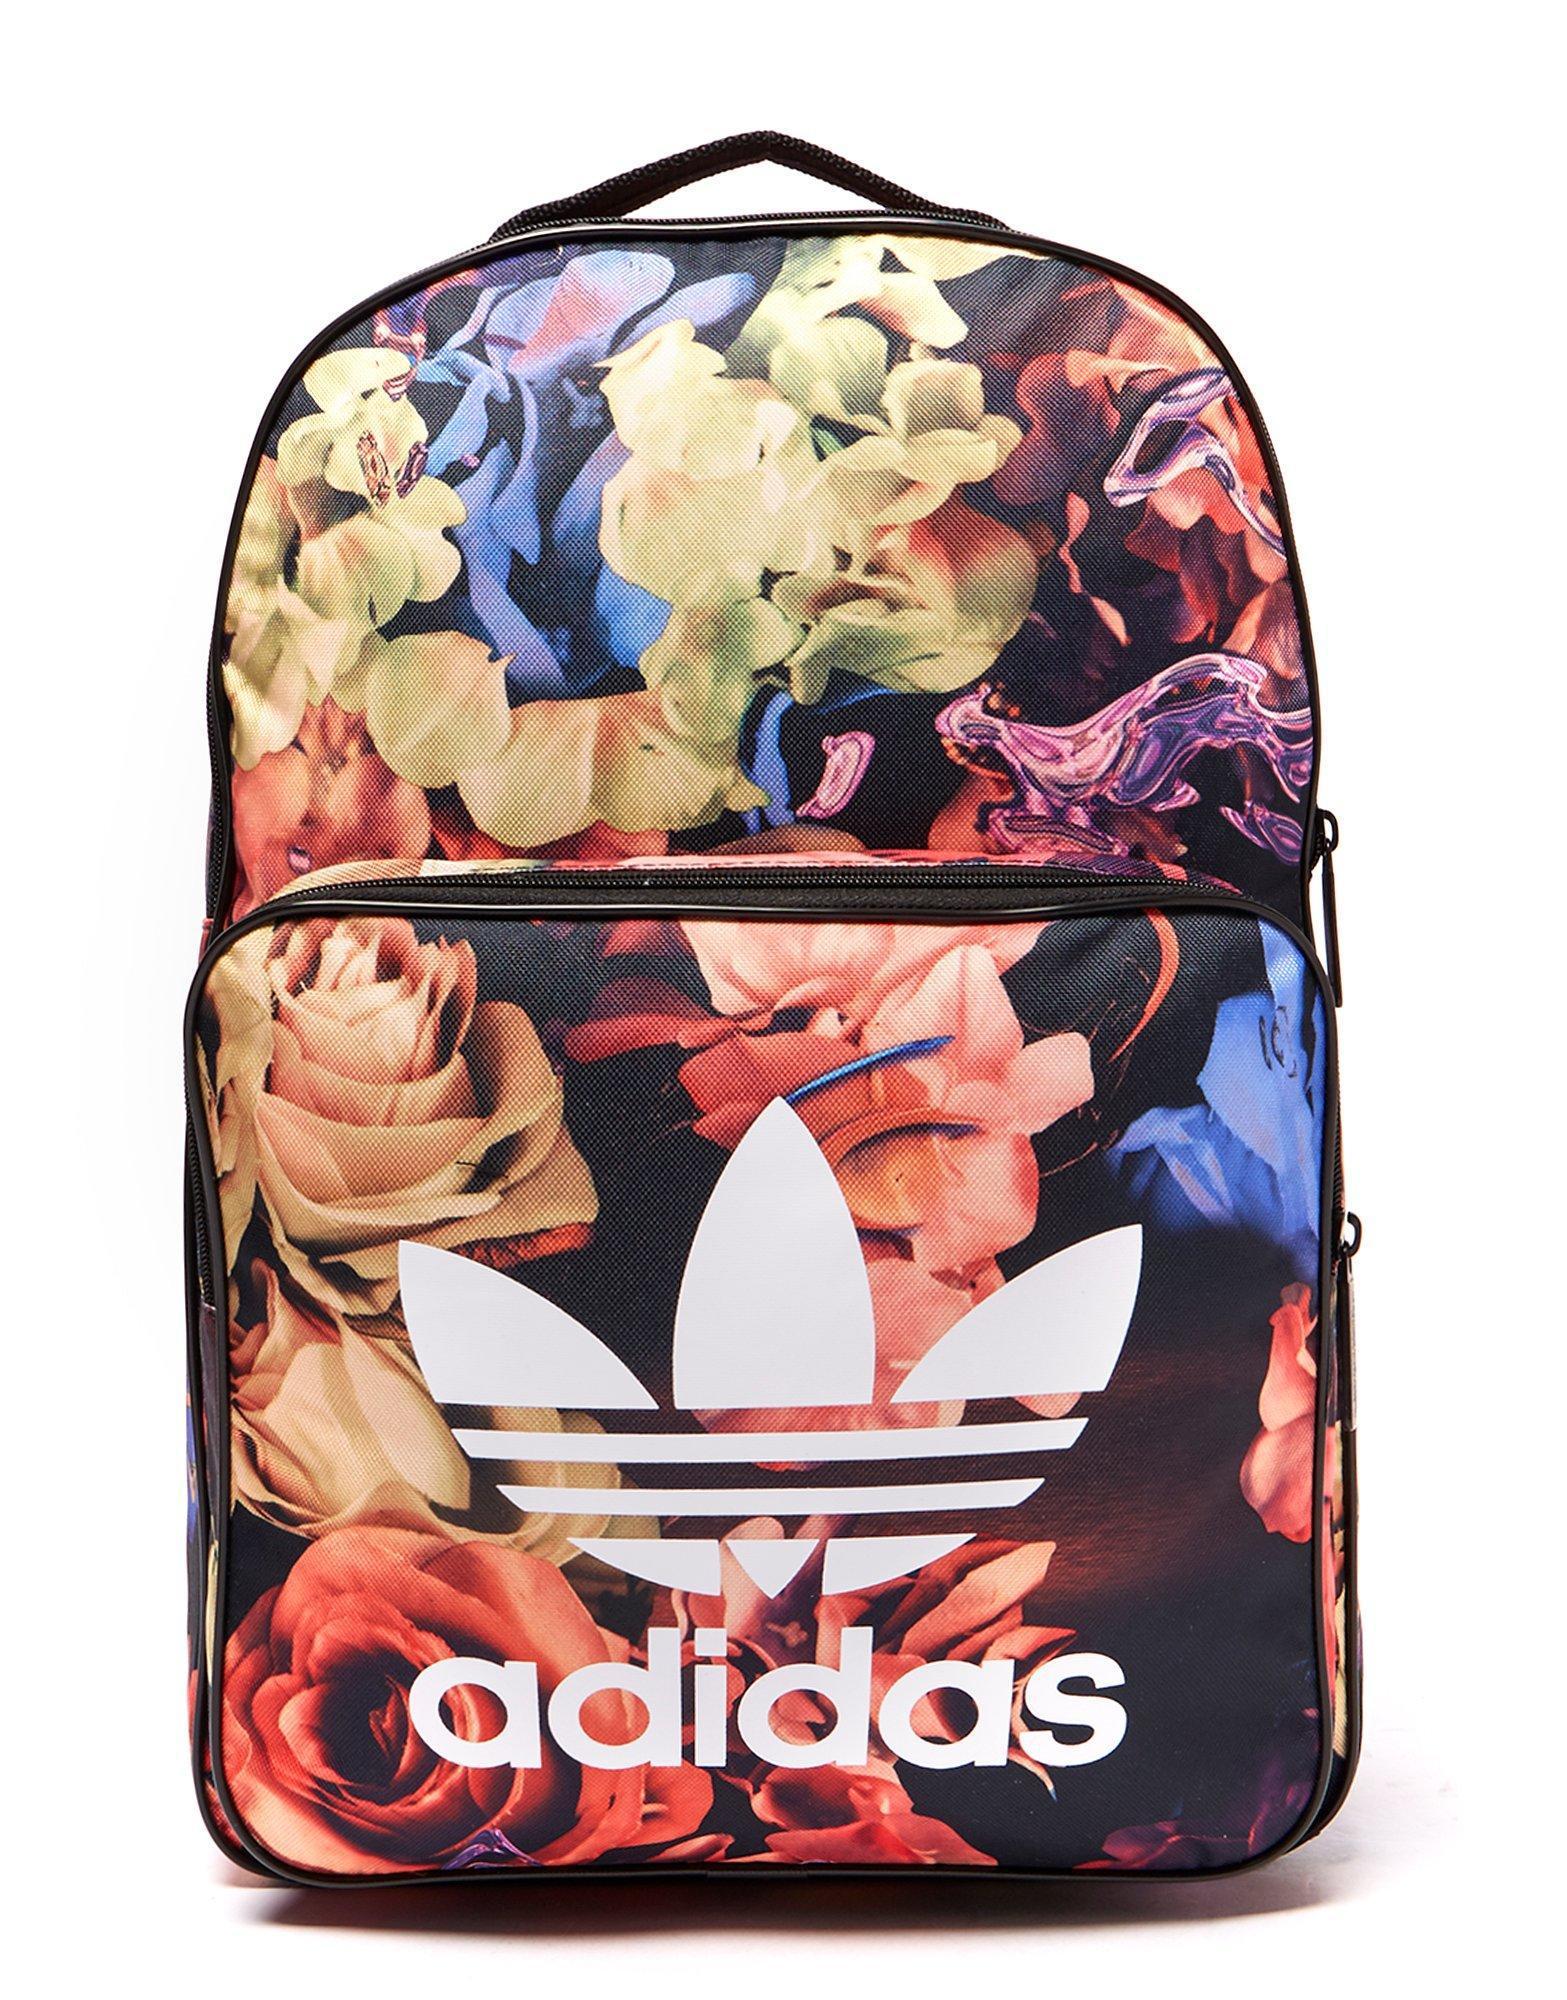 47ff3e9ceb86 Sports Direct Adidas Originals Bag- Fenix Toulouse Handball